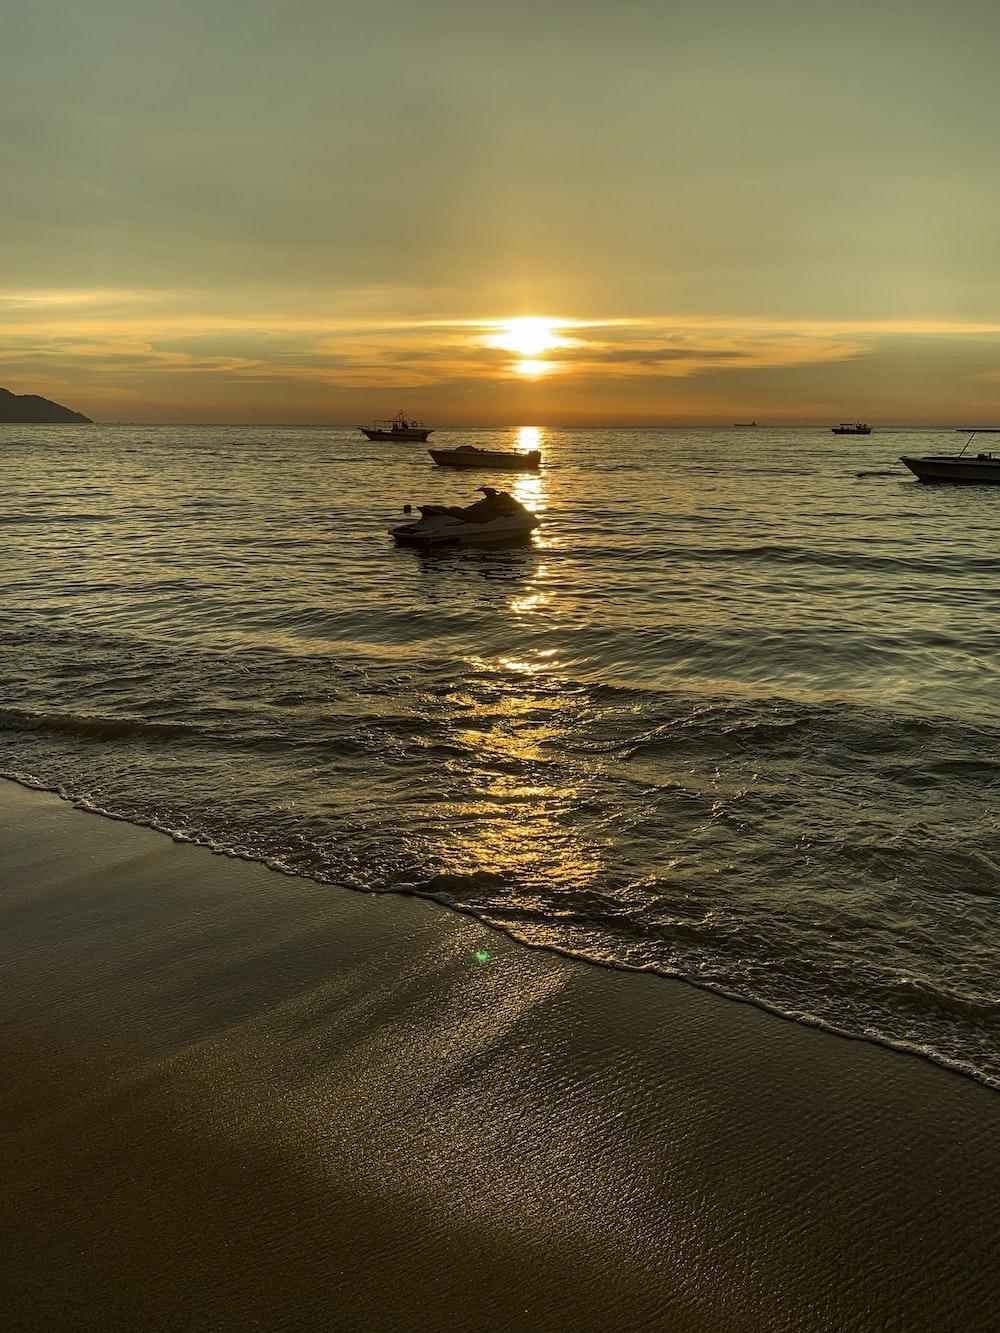 calm ocean at unset